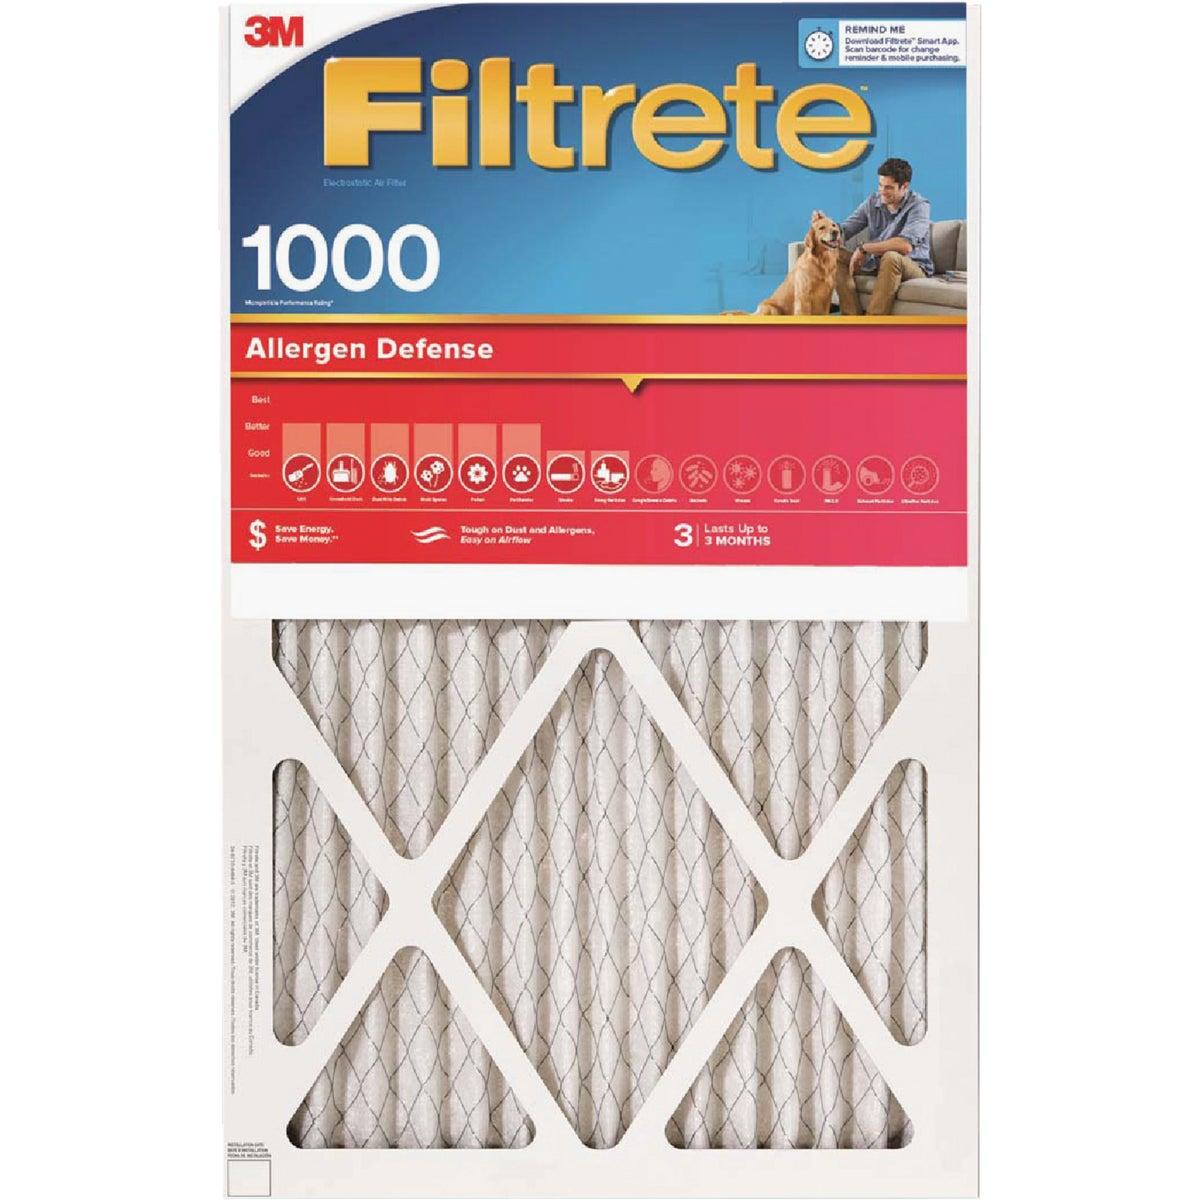 3M Filtrete 14 In. x 14 In. x 1 In. Allergen Defense 1000/1085 MPR Furnace Filter